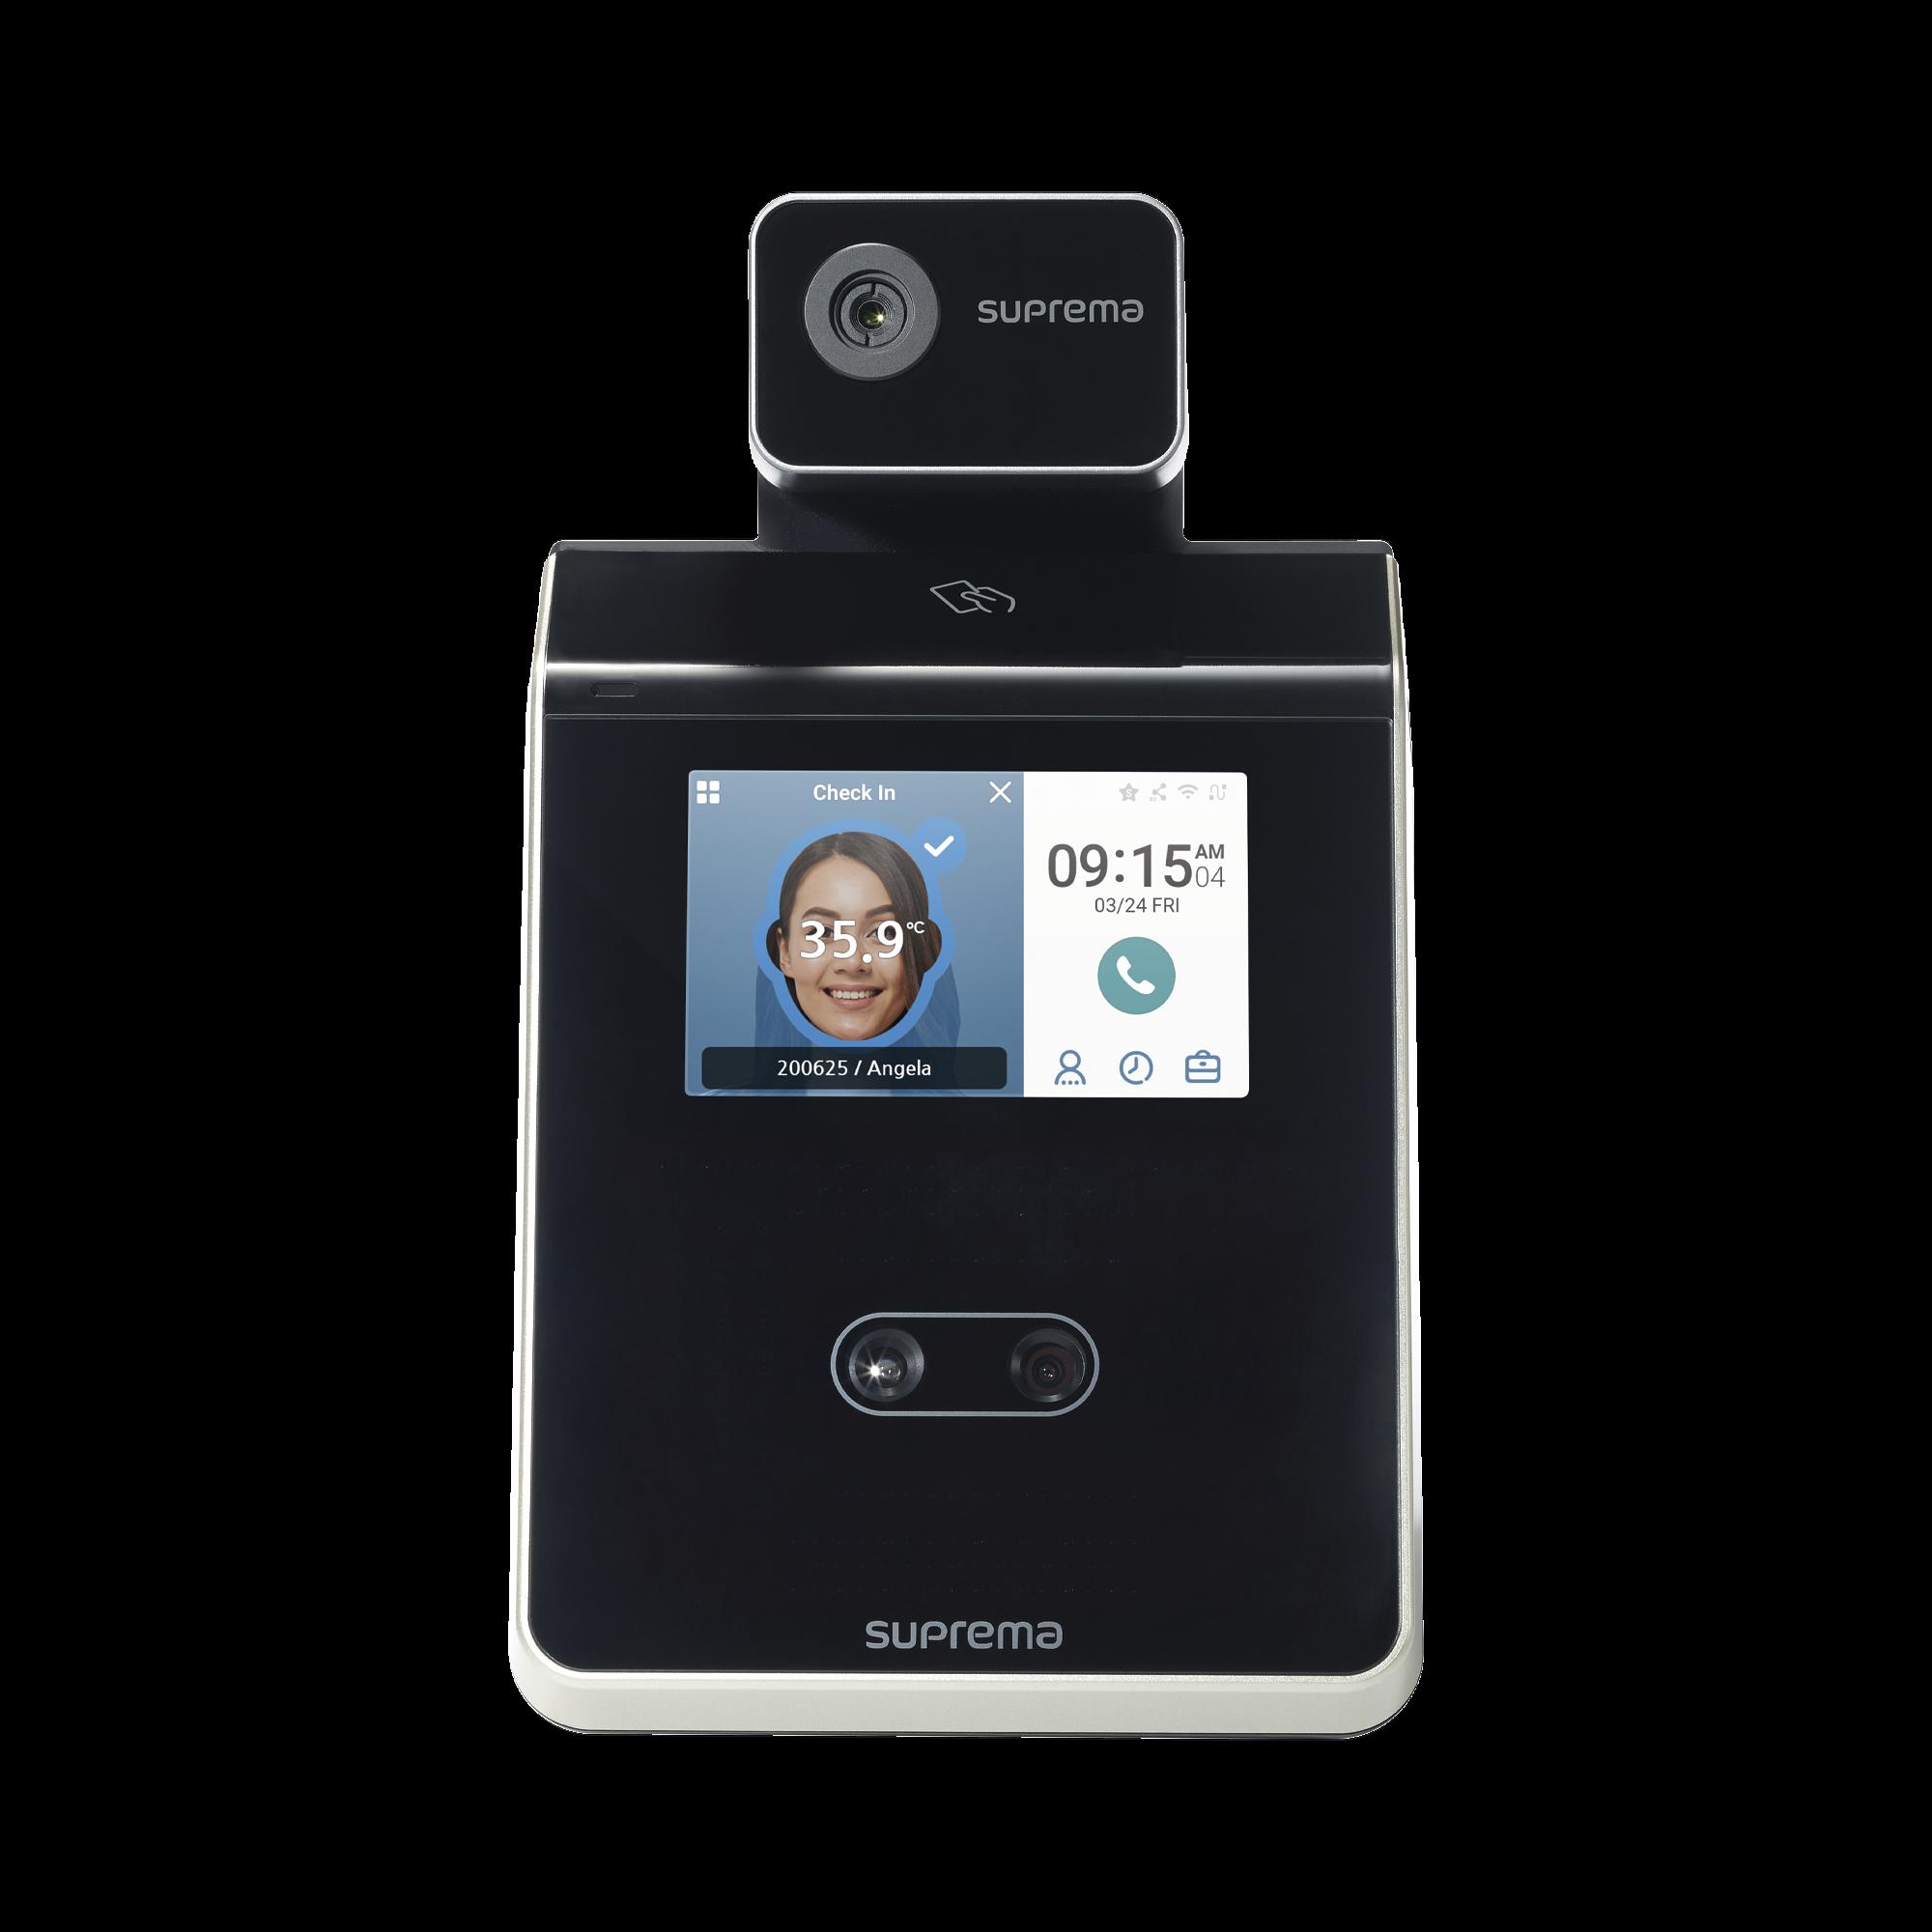 FaceStation 2 Lector Facial/ Notificación por Temperatura Alta /  Bluetooth MultiClass SE Dual RFID (125KHZ EM HID PROX 13.56MHZ Mifare DesFire / EV1 FELICA ICLASS S) Compatible con BioStar2